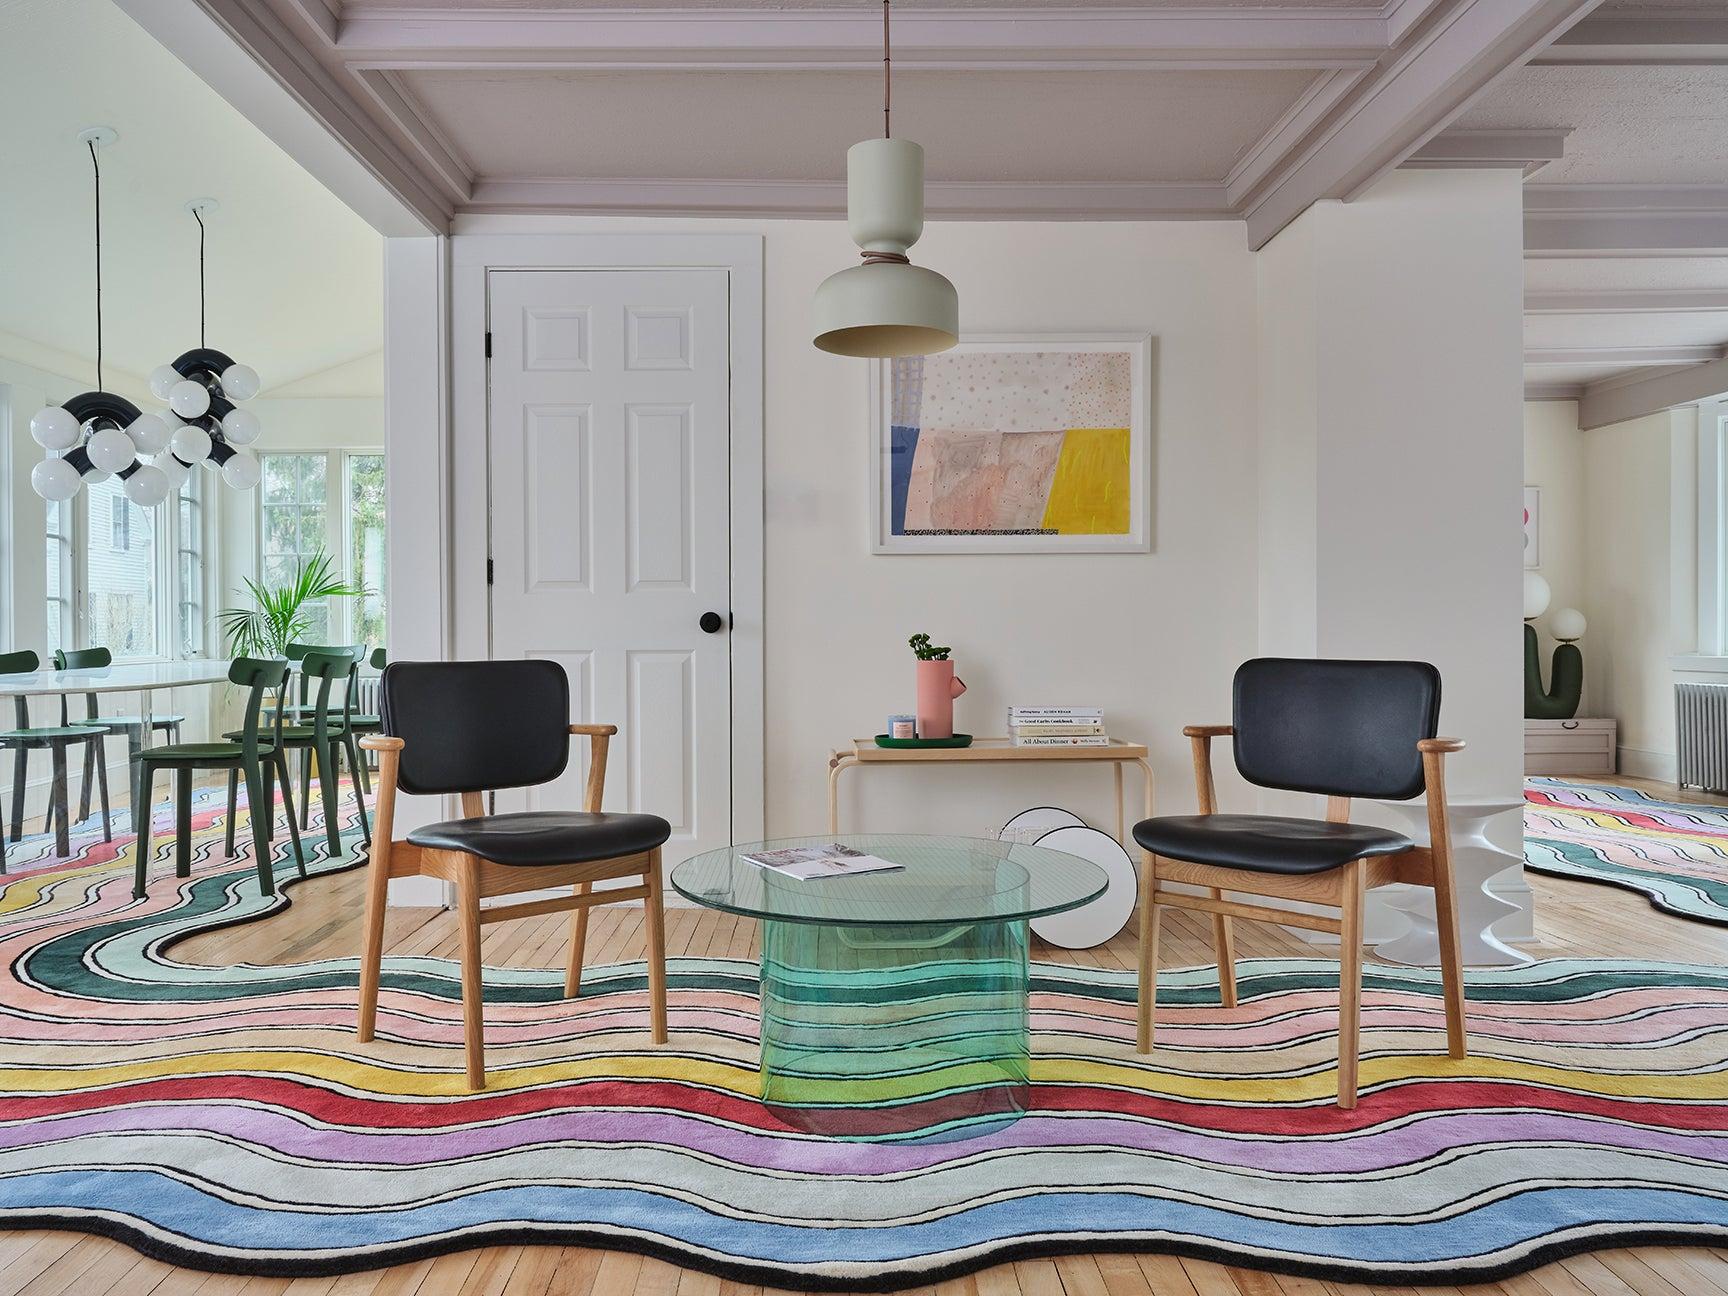 wavy rainbow rug that wraps in a horseshoe